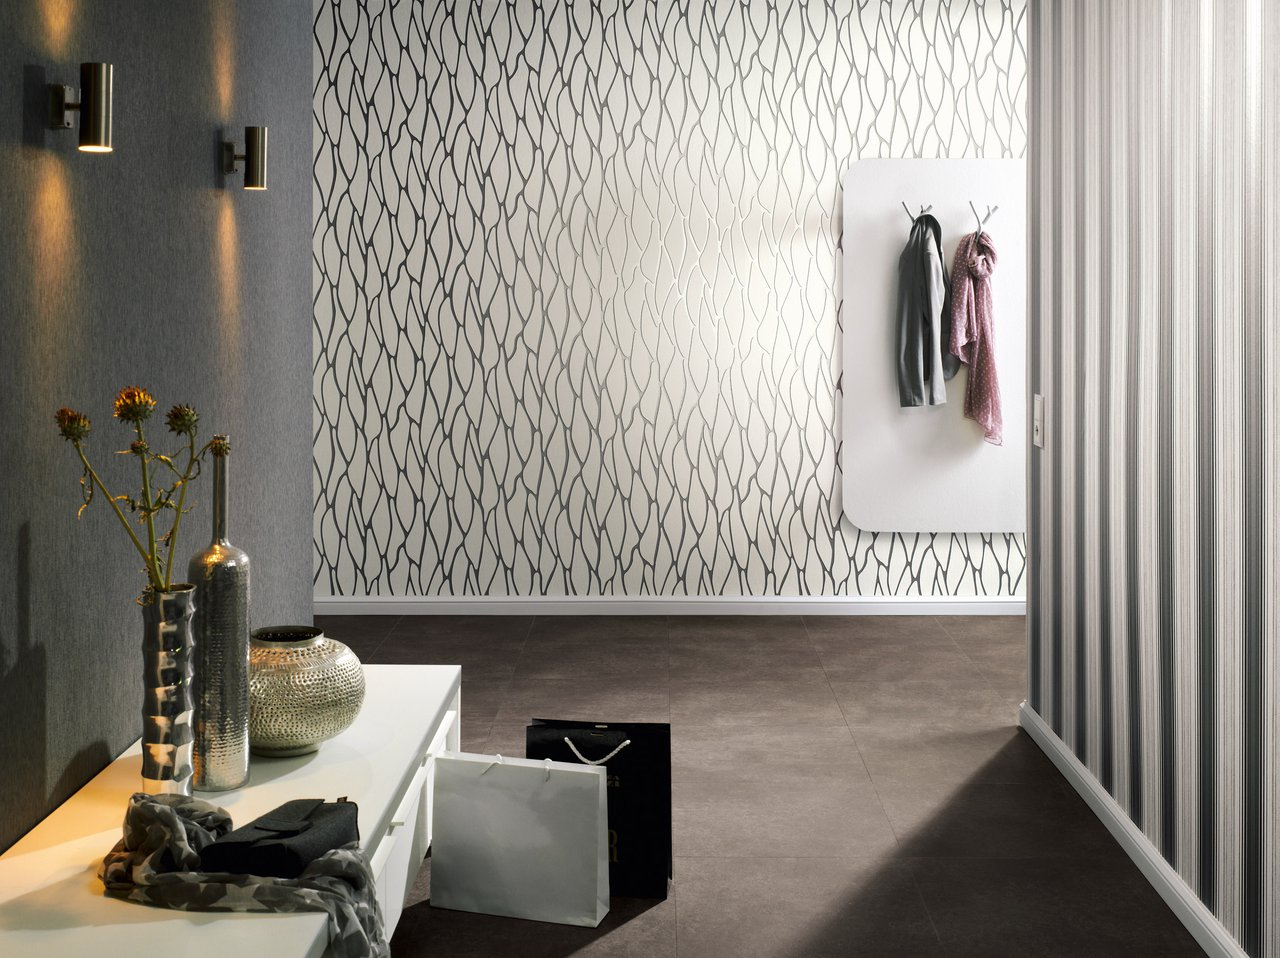 tapeten malerwerkst tte dieter geiger gmbh. Black Bedroom Furniture Sets. Home Design Ideas